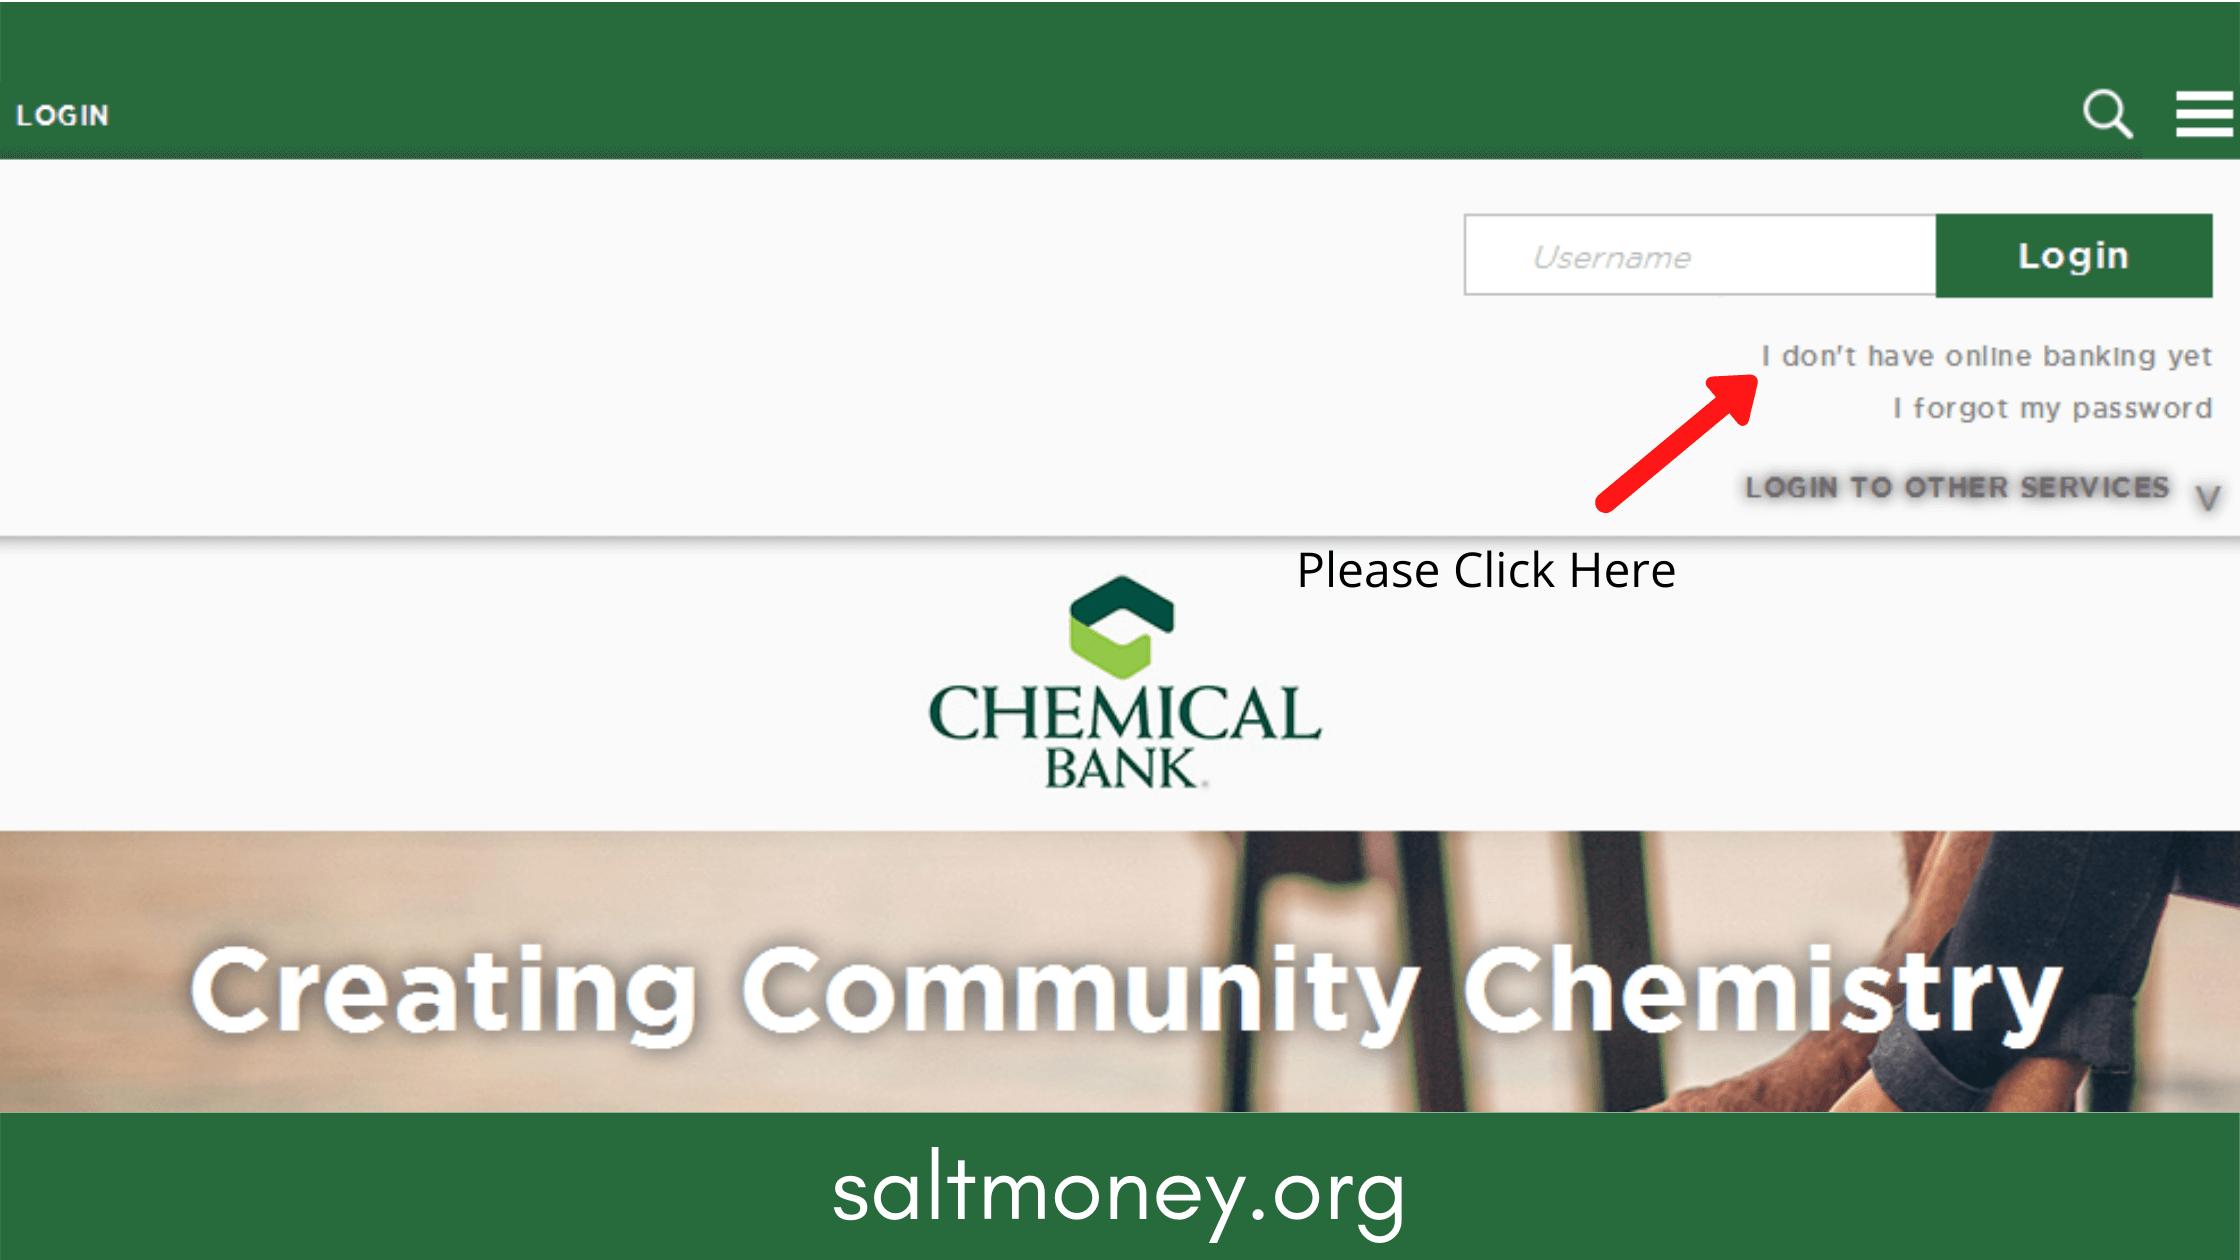 Chemical Bank Image 1